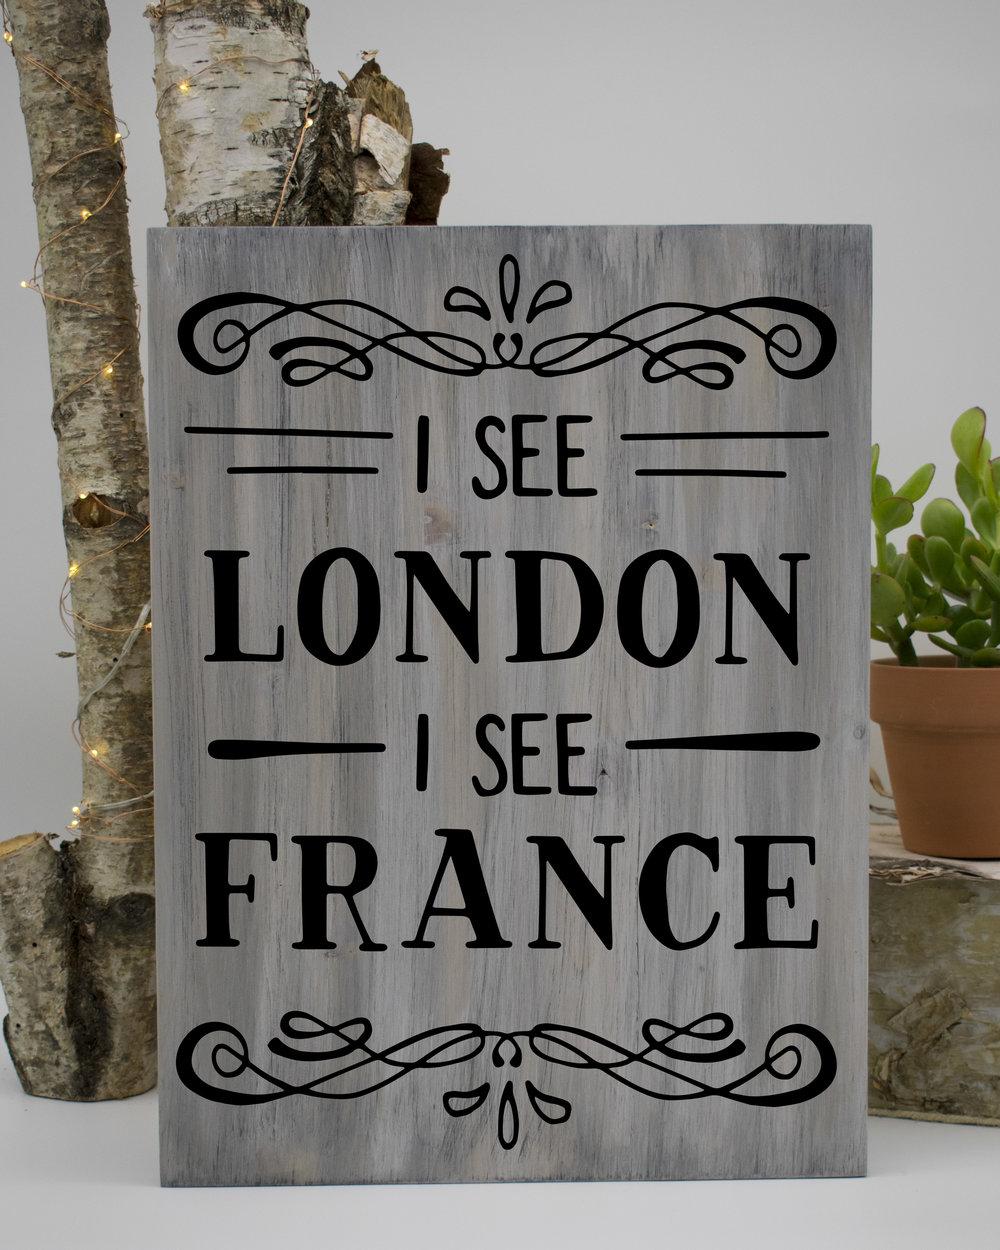 londonfrance.jpg